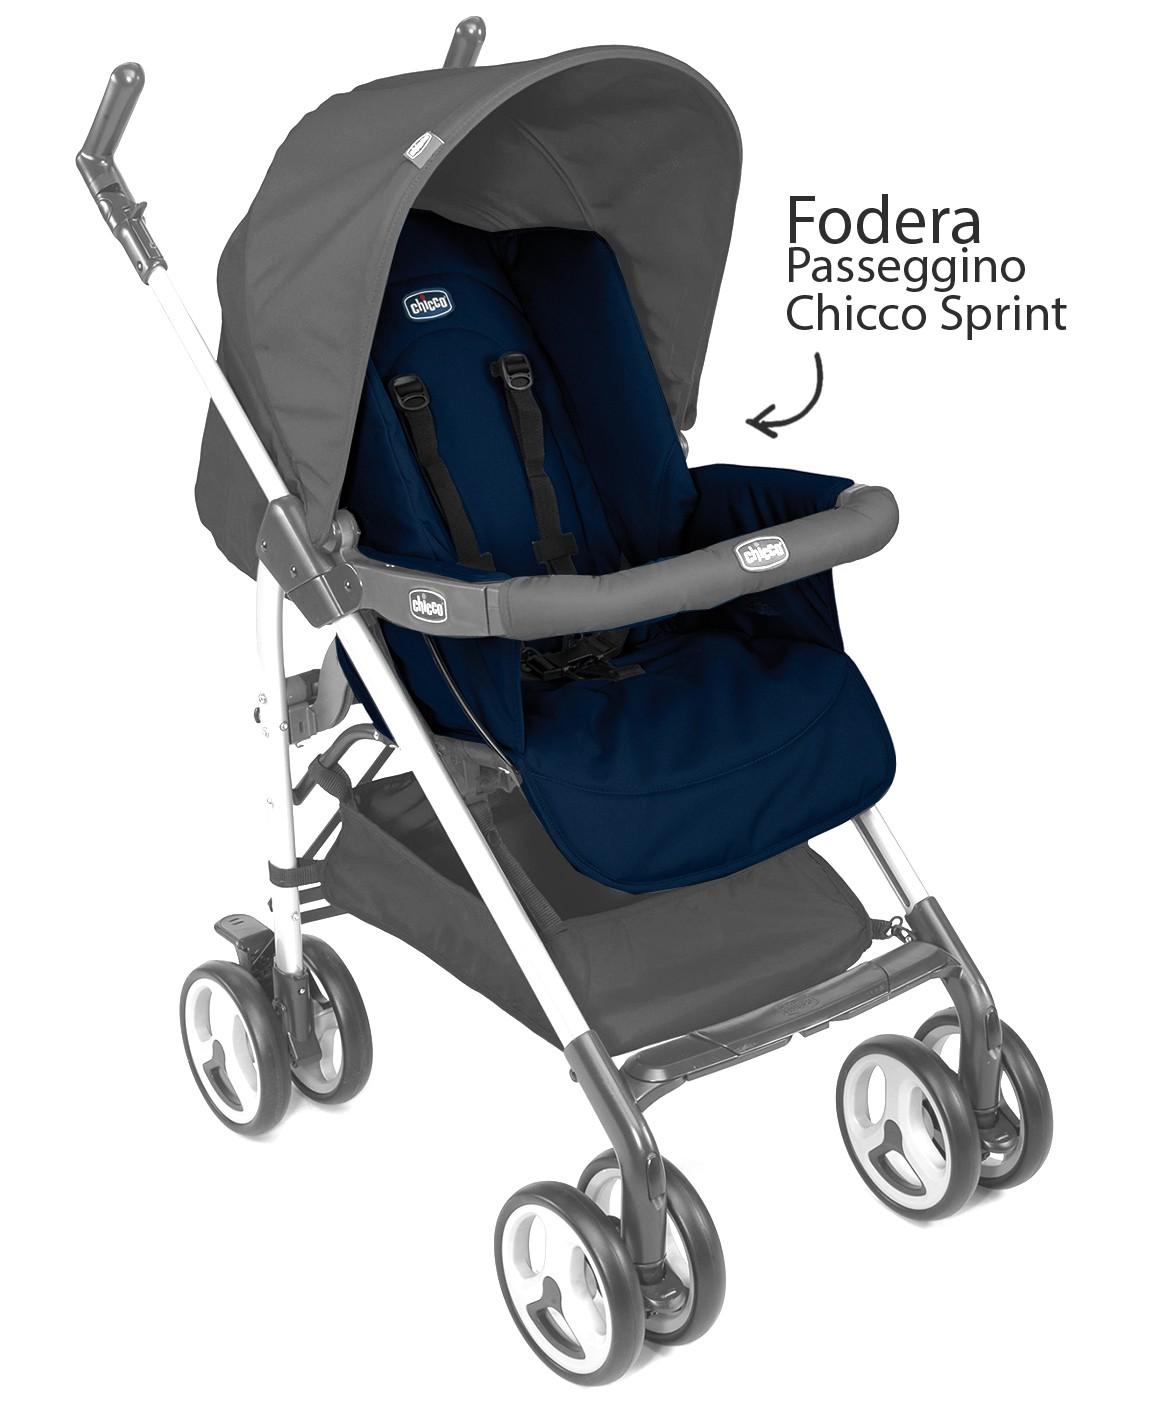 Fodera Passeggino Sprint Chicco Blue